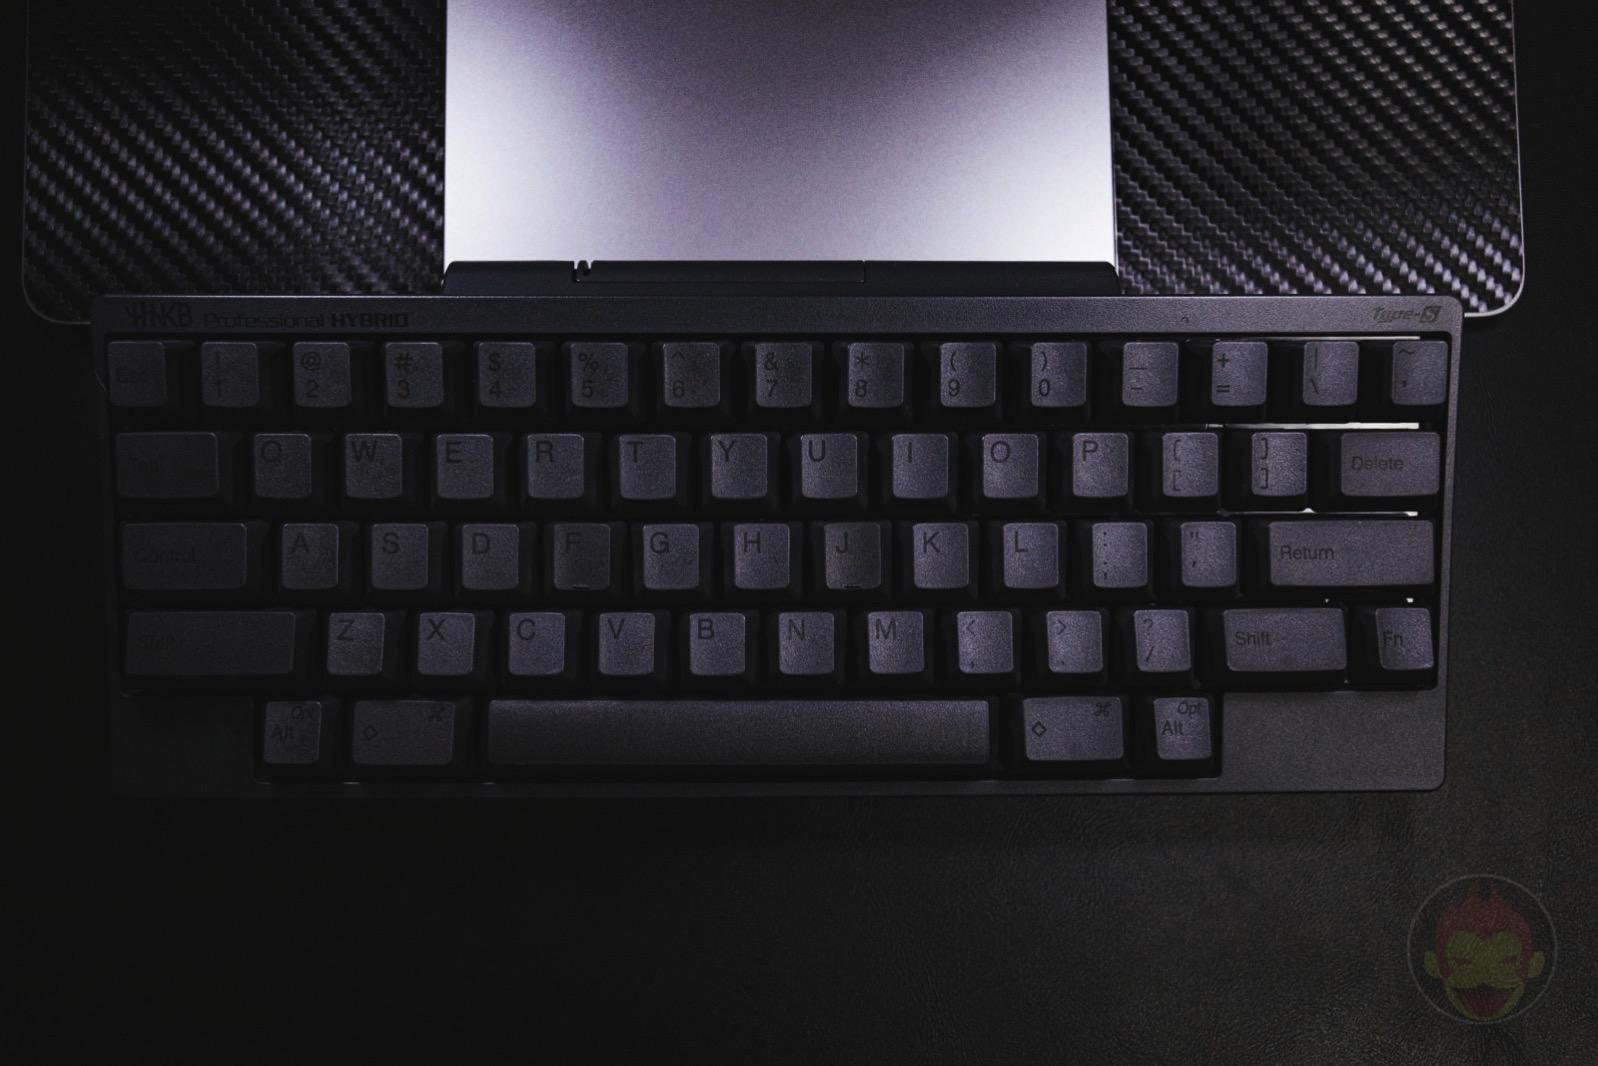 Happy-Hacking-Keyboard-Professional-Hybird-Handson-07.jpg